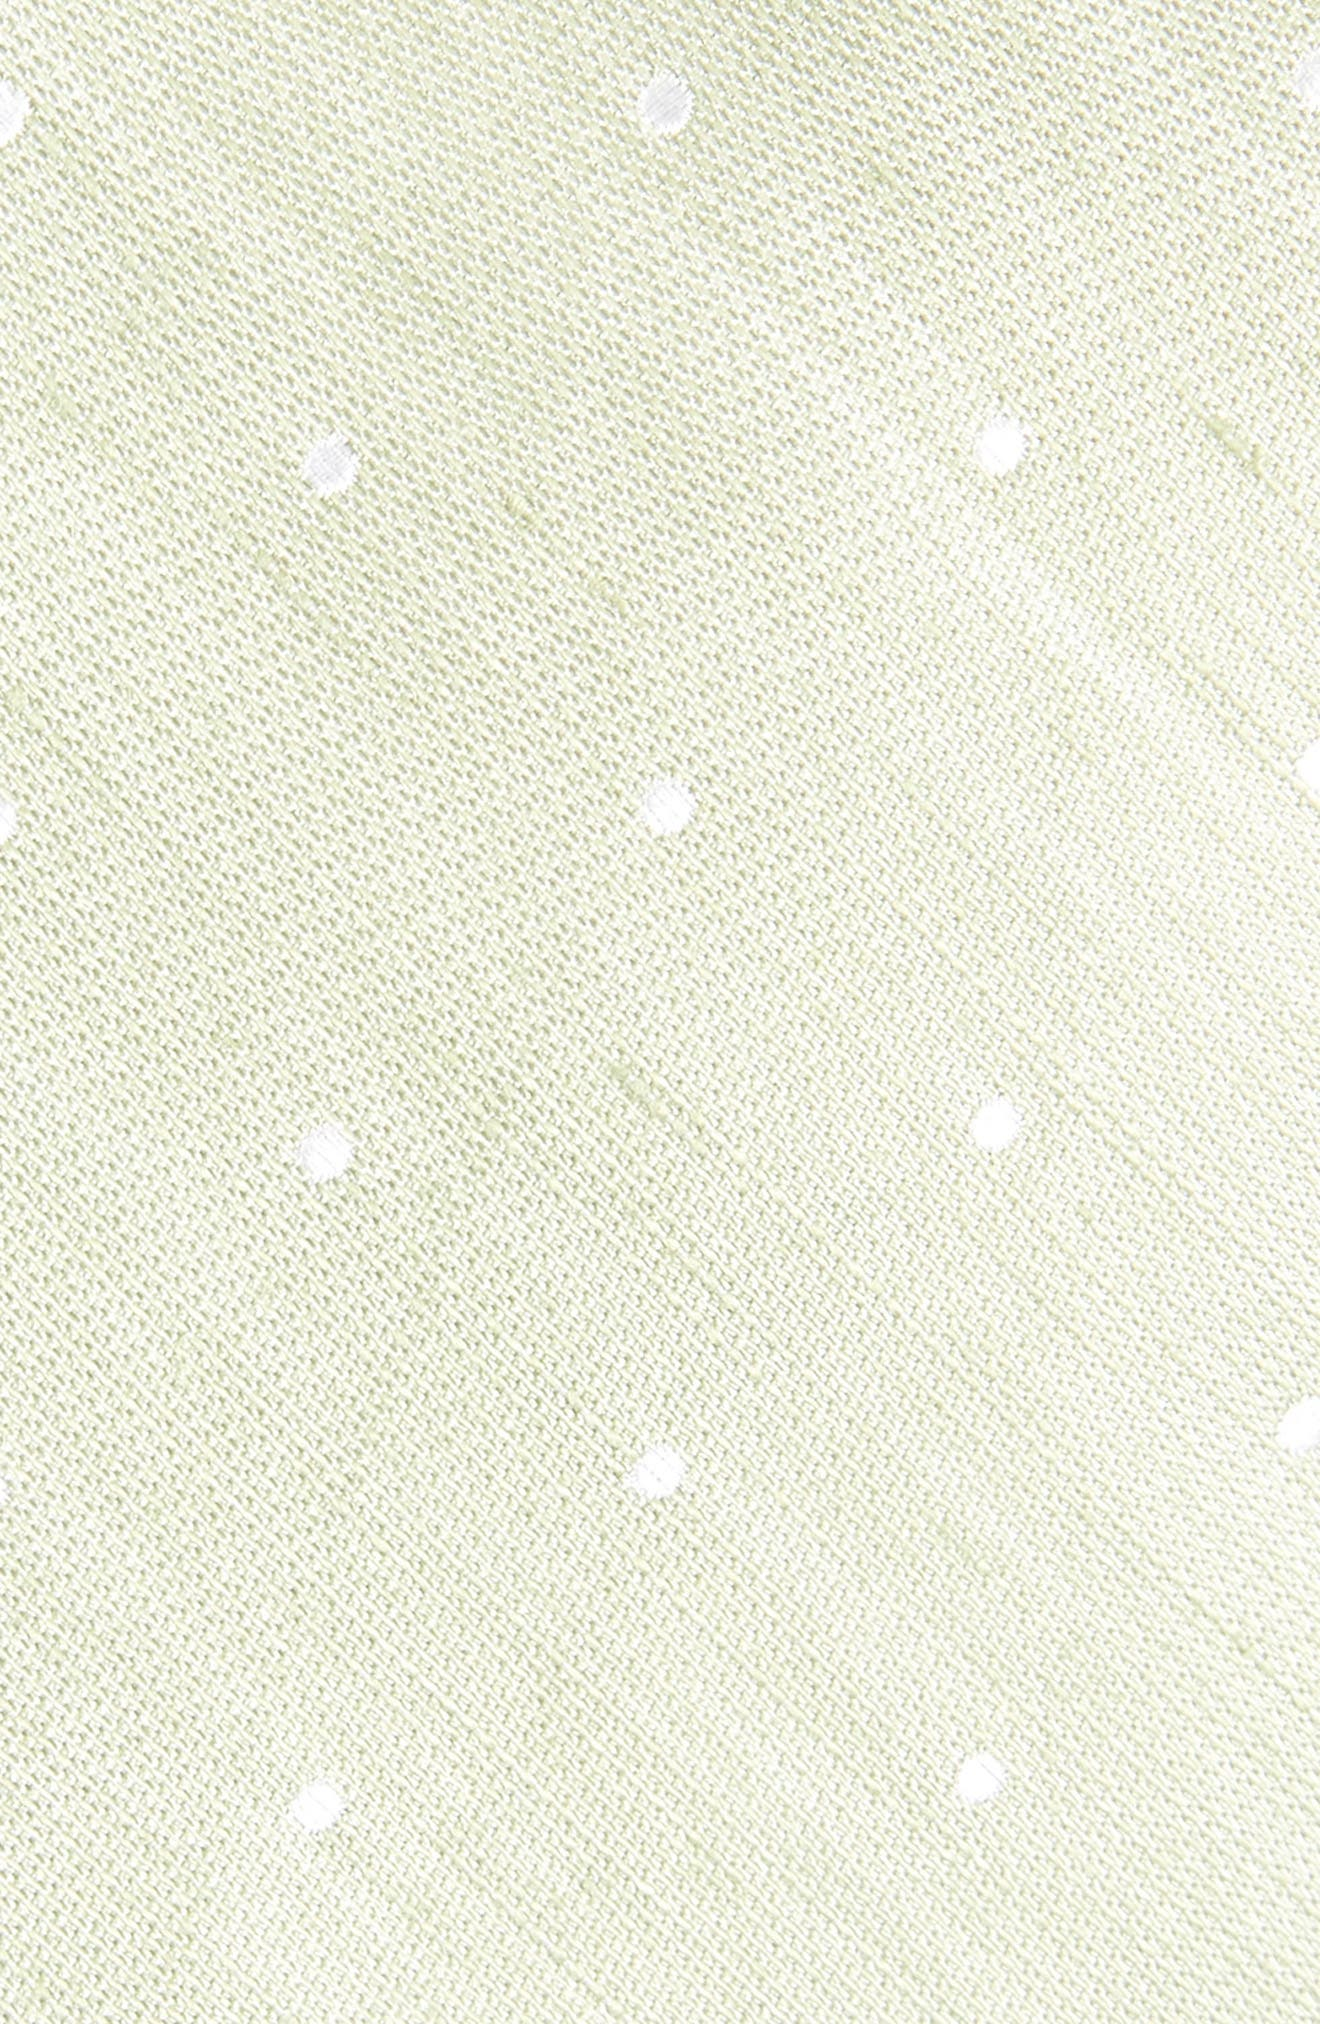 Bulletin Dot Silk & Linen Tie,                             Alternate thumbnail 2, color,                             Sage Green